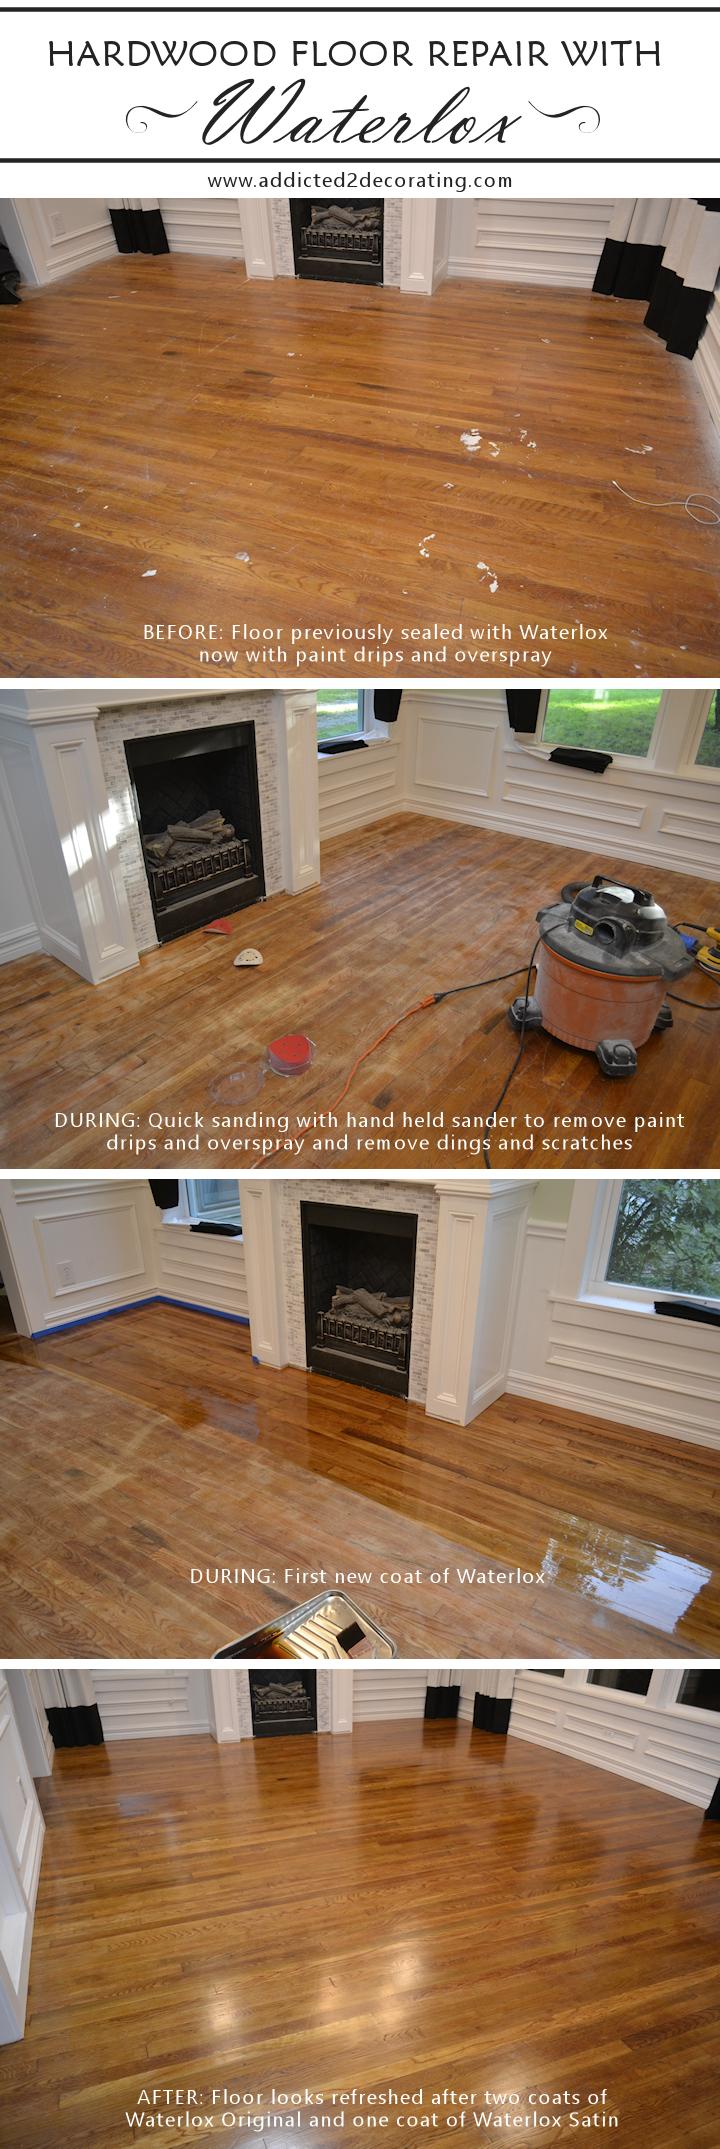 Finished Roman Shade And Finished Hardwood Floor Refresh Pinterest - How to refresh hardwood floors